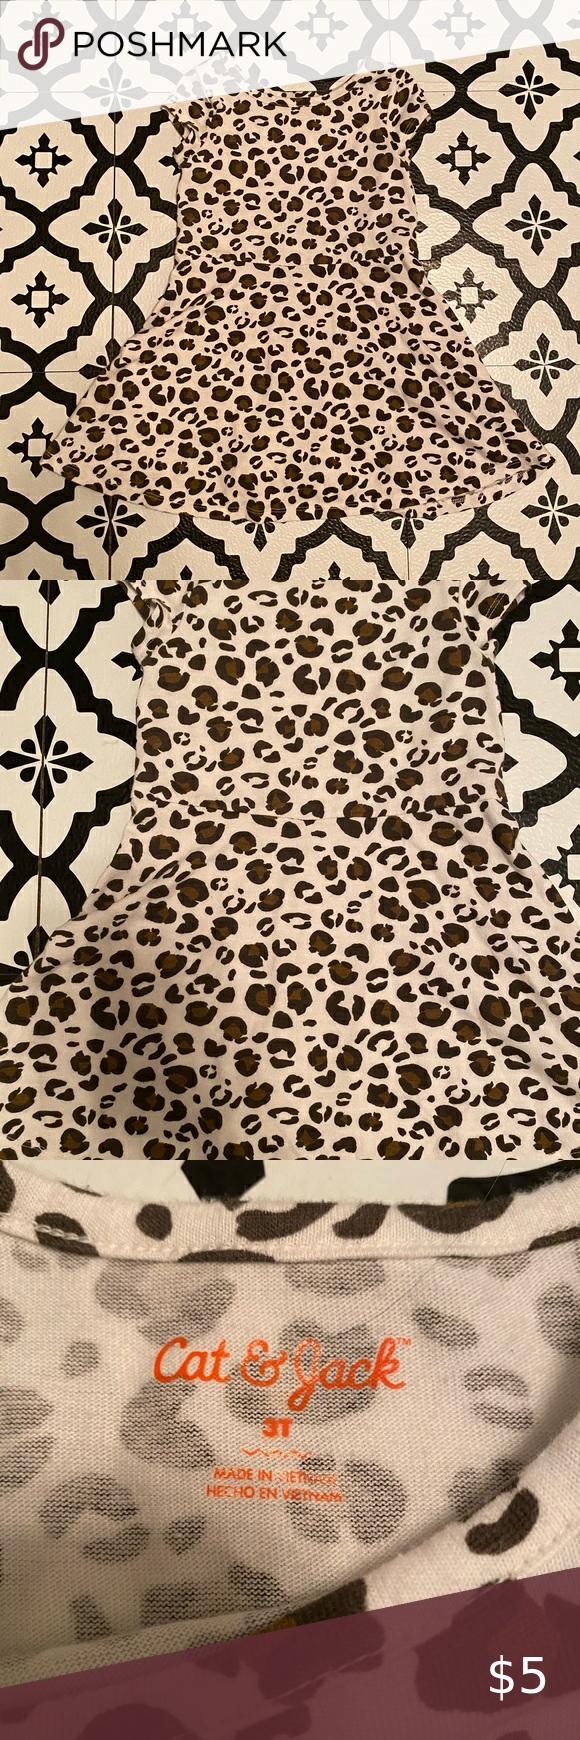 22++ Cat and jack leopard dress ideas